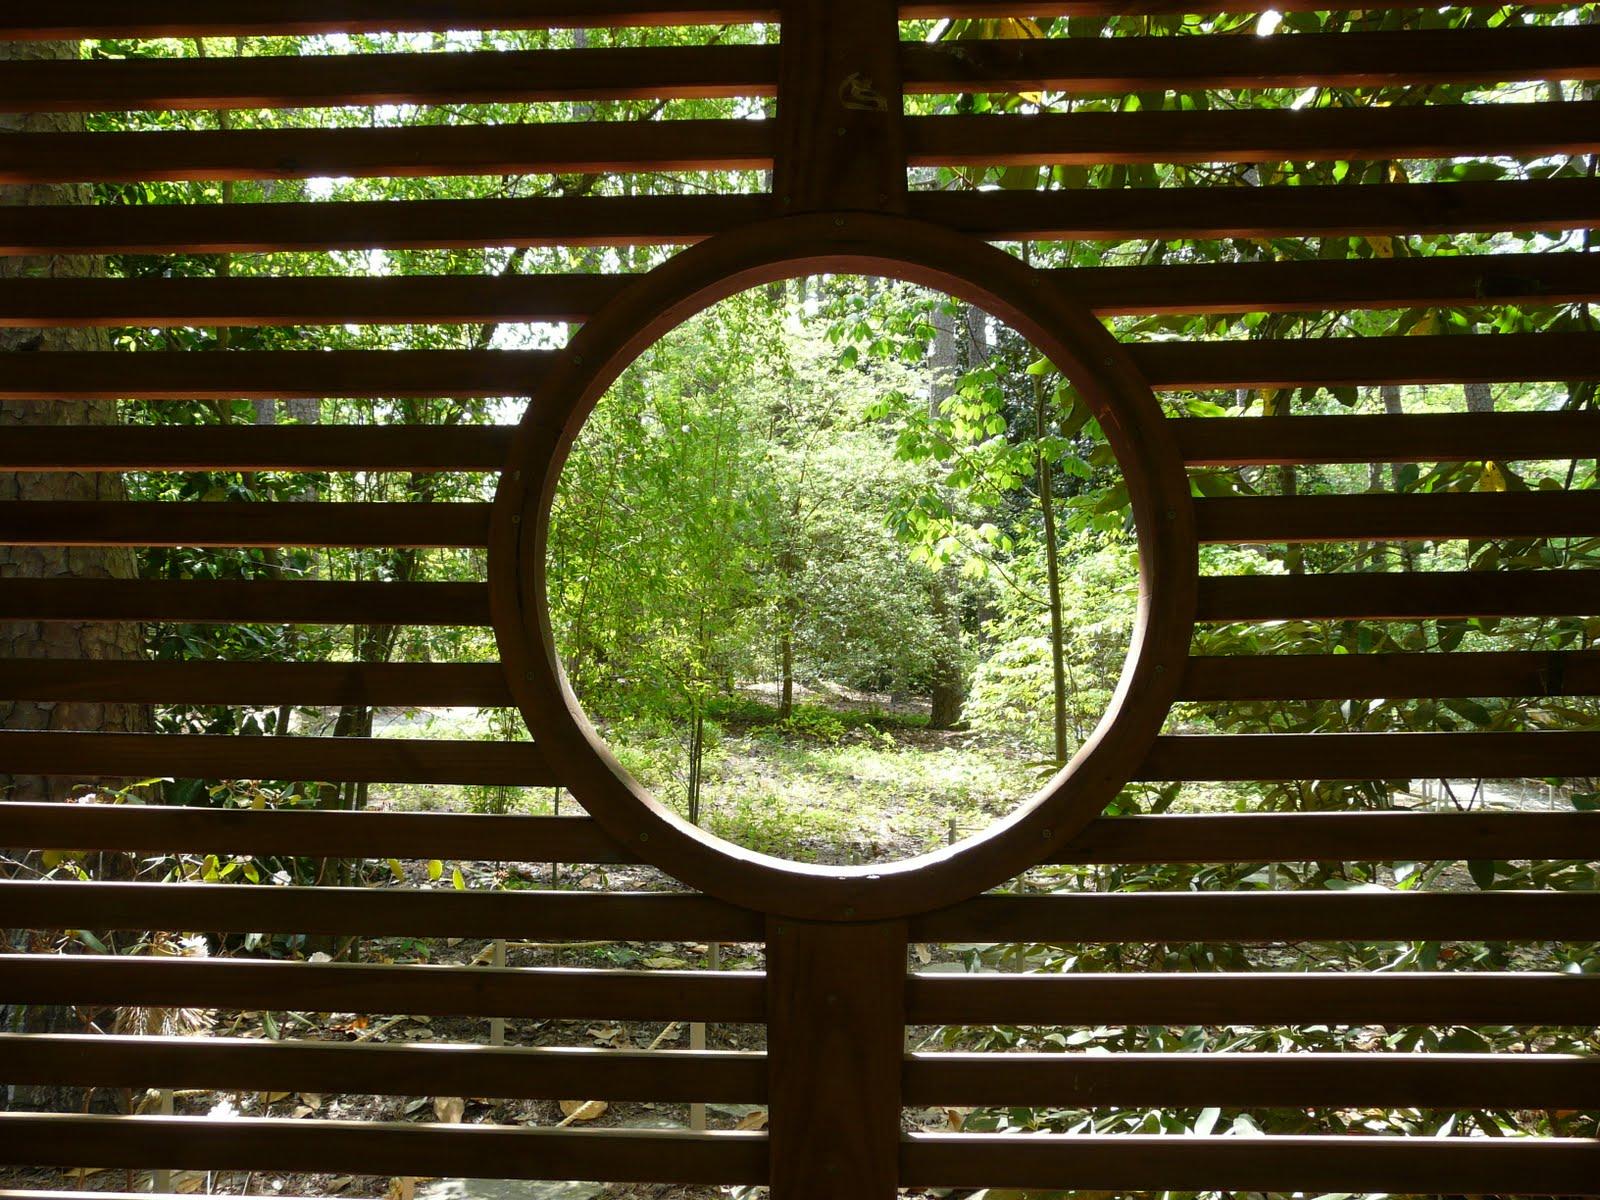 The wildlife garden in the h l blomquist garden of native plants - The H L Bloomquist Garden Of Native Plants